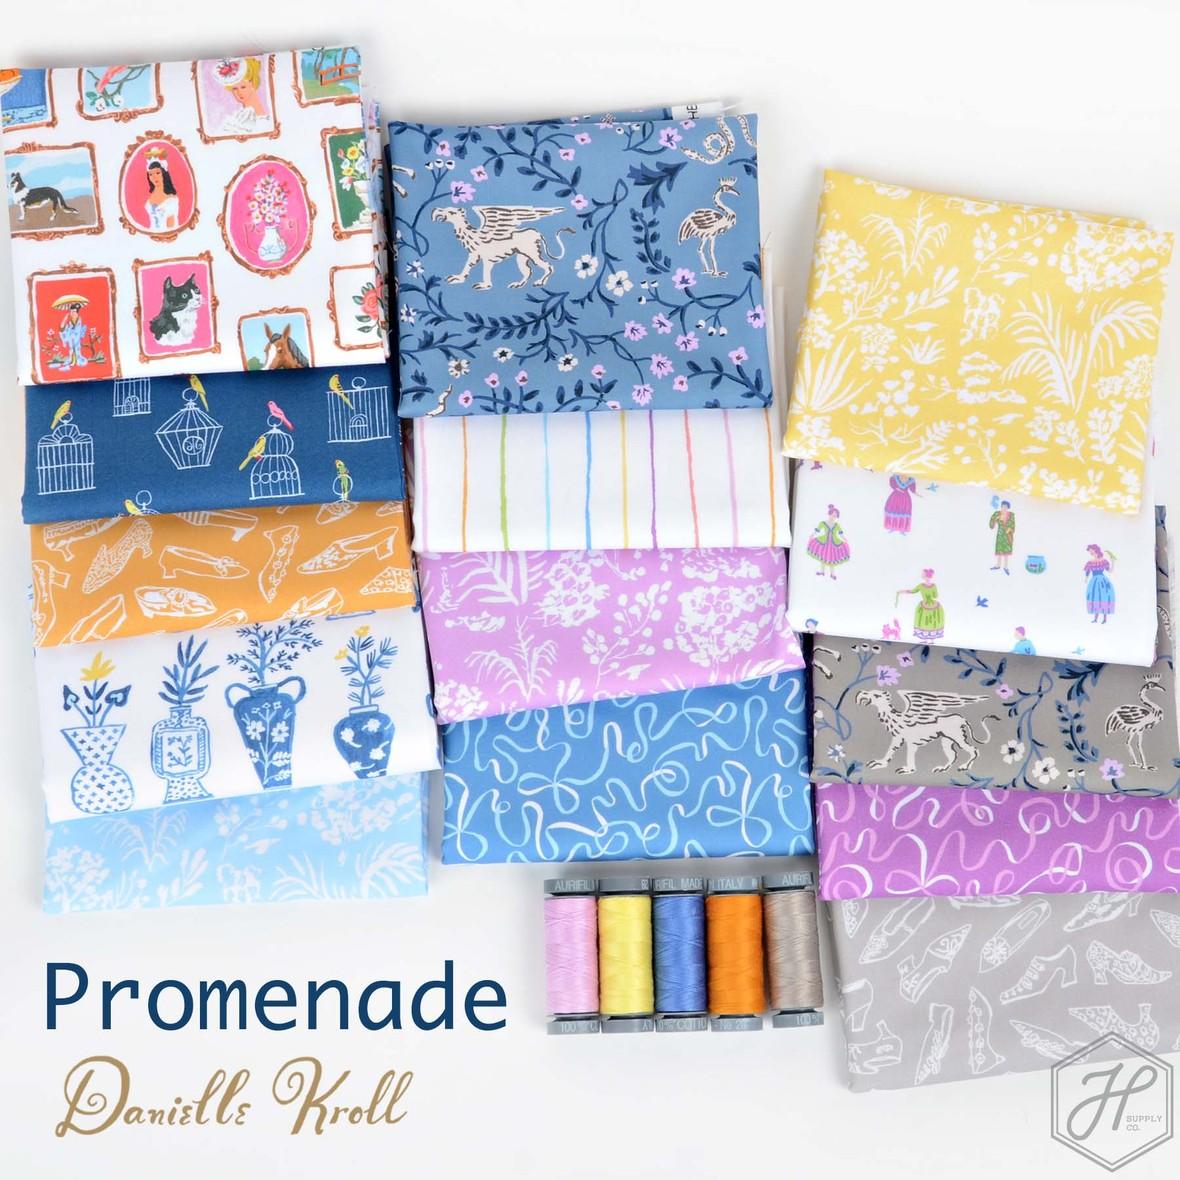 Promenade Danielle Kroll for Figo Fabric at Hawthorne Supply Co